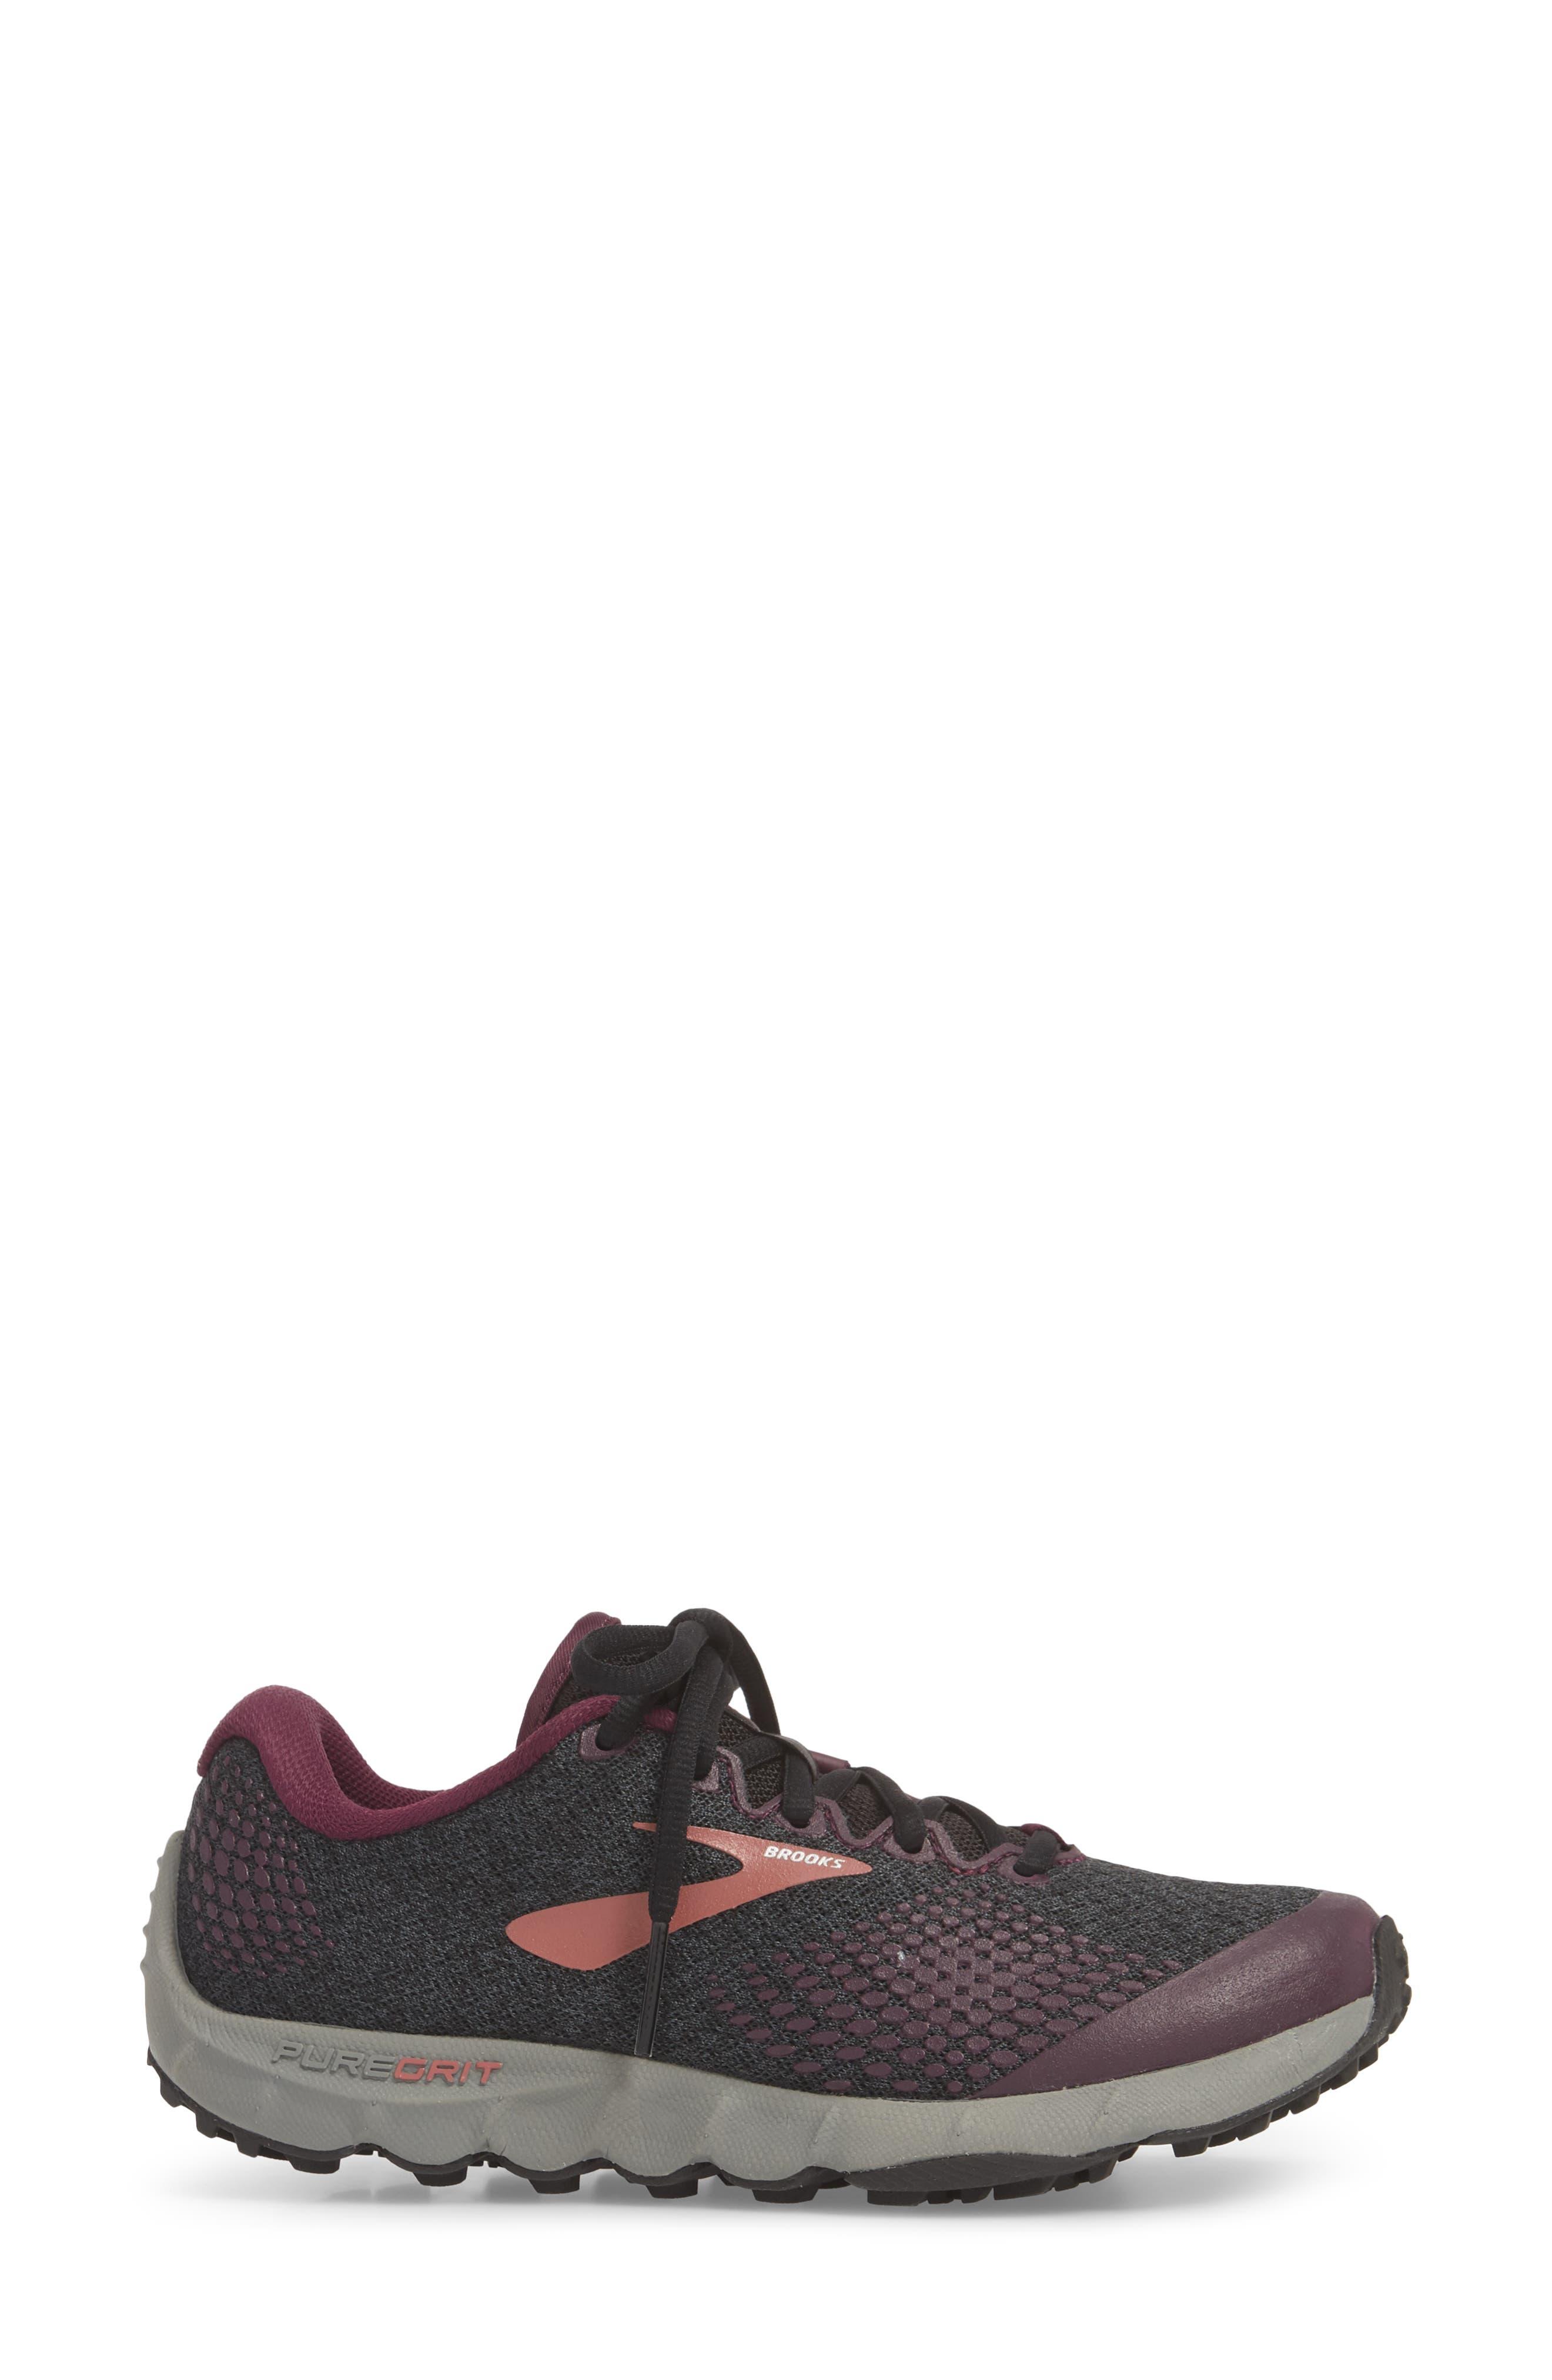 PureGrit 7 Trail Running Shoe,                             Alternate thumbnail 3, color,                             BLACK/ PURPLE/ GREY